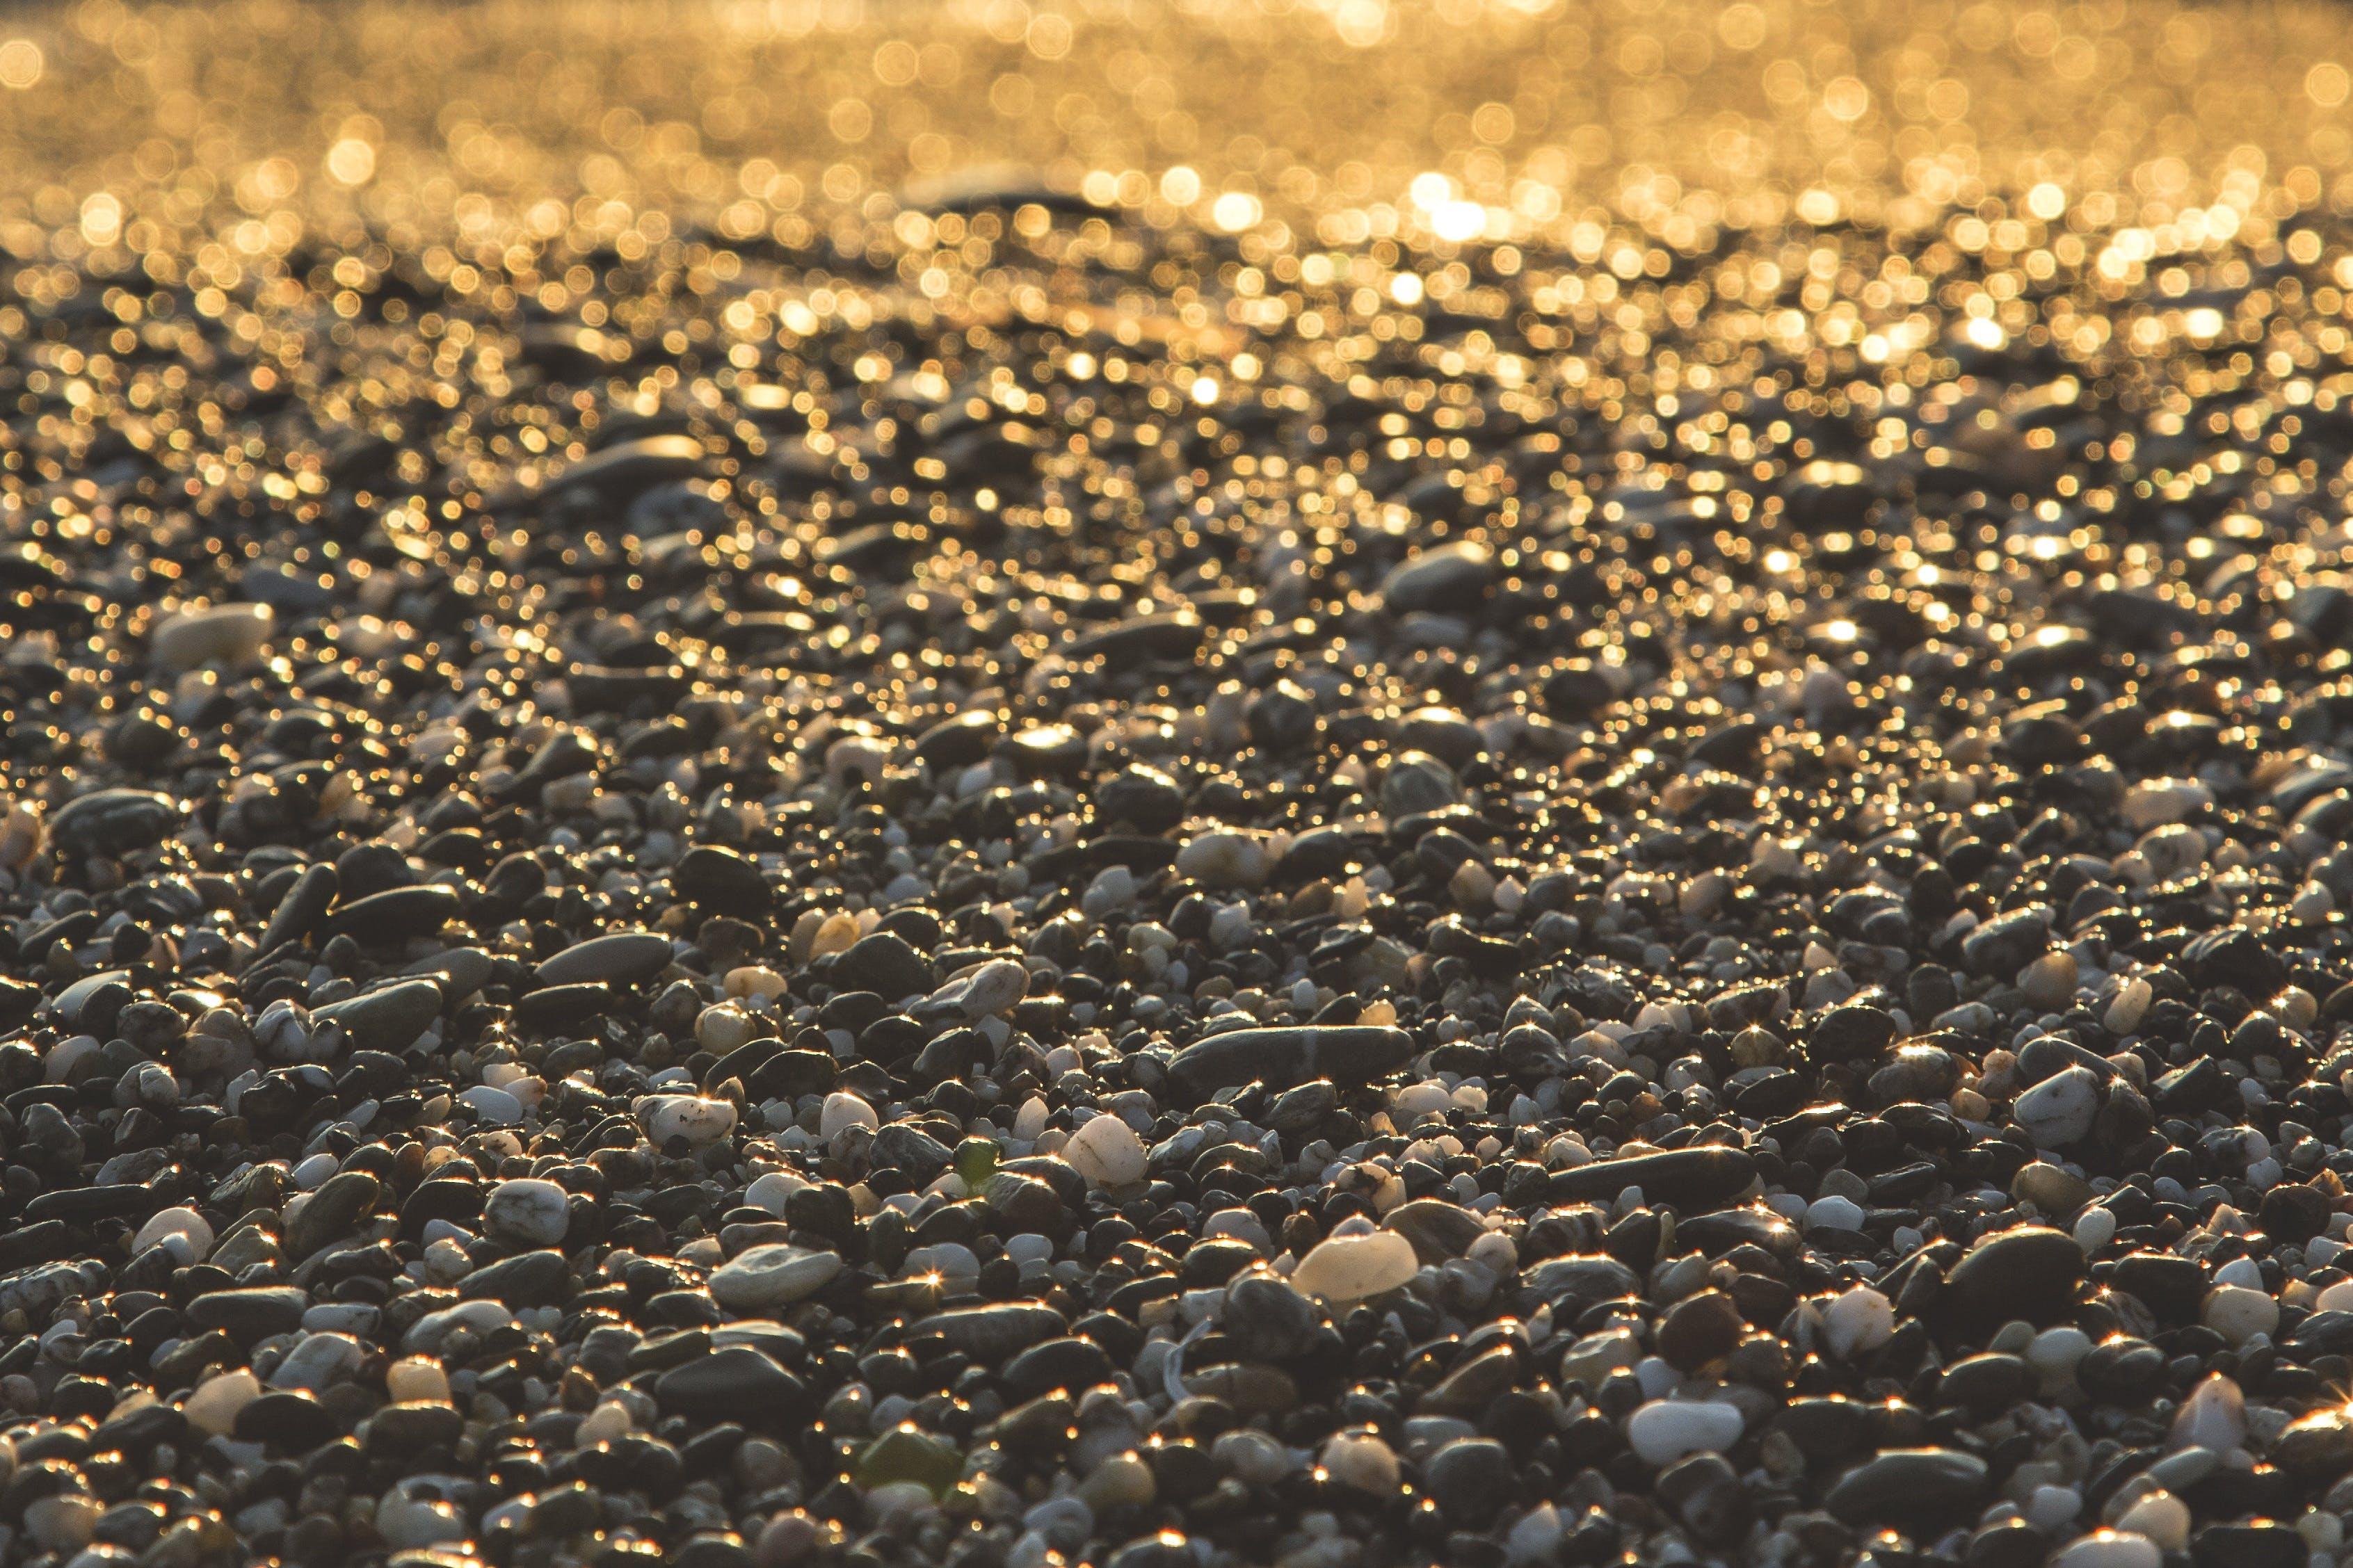 Pebble Stone on Ground